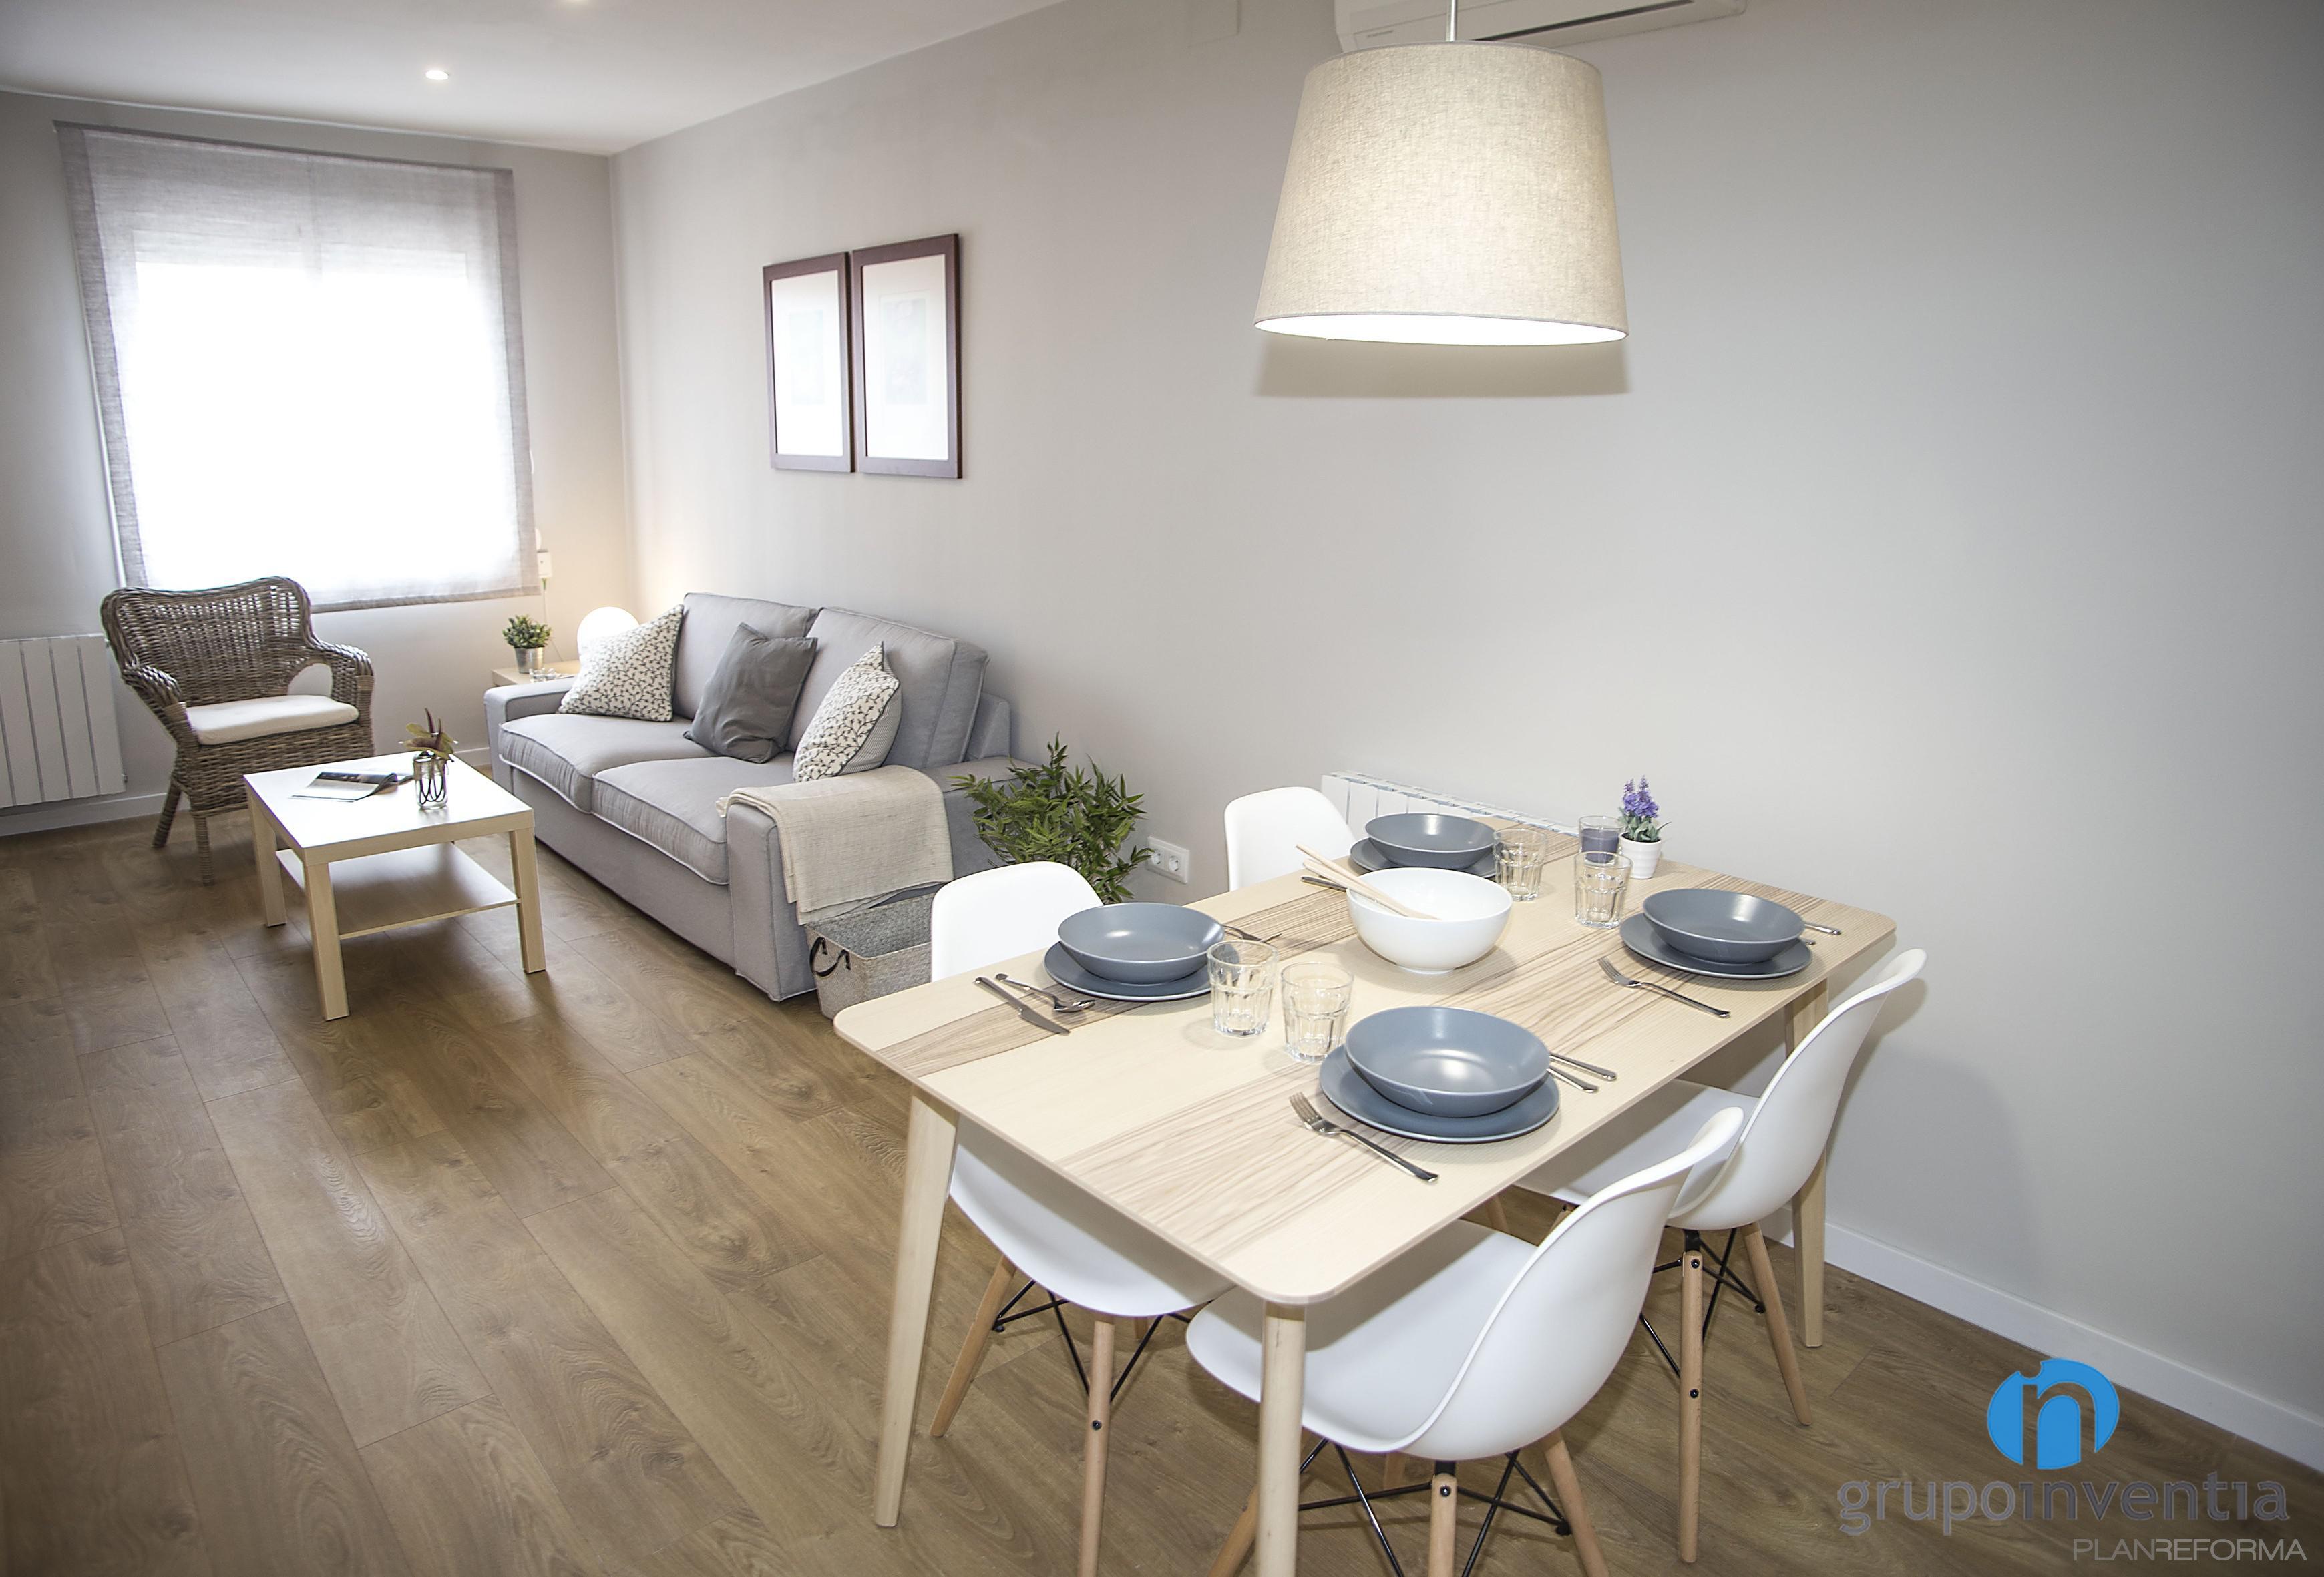 Comedor salon estilo moderno color beige blanco gris for Comedor estilo moderno